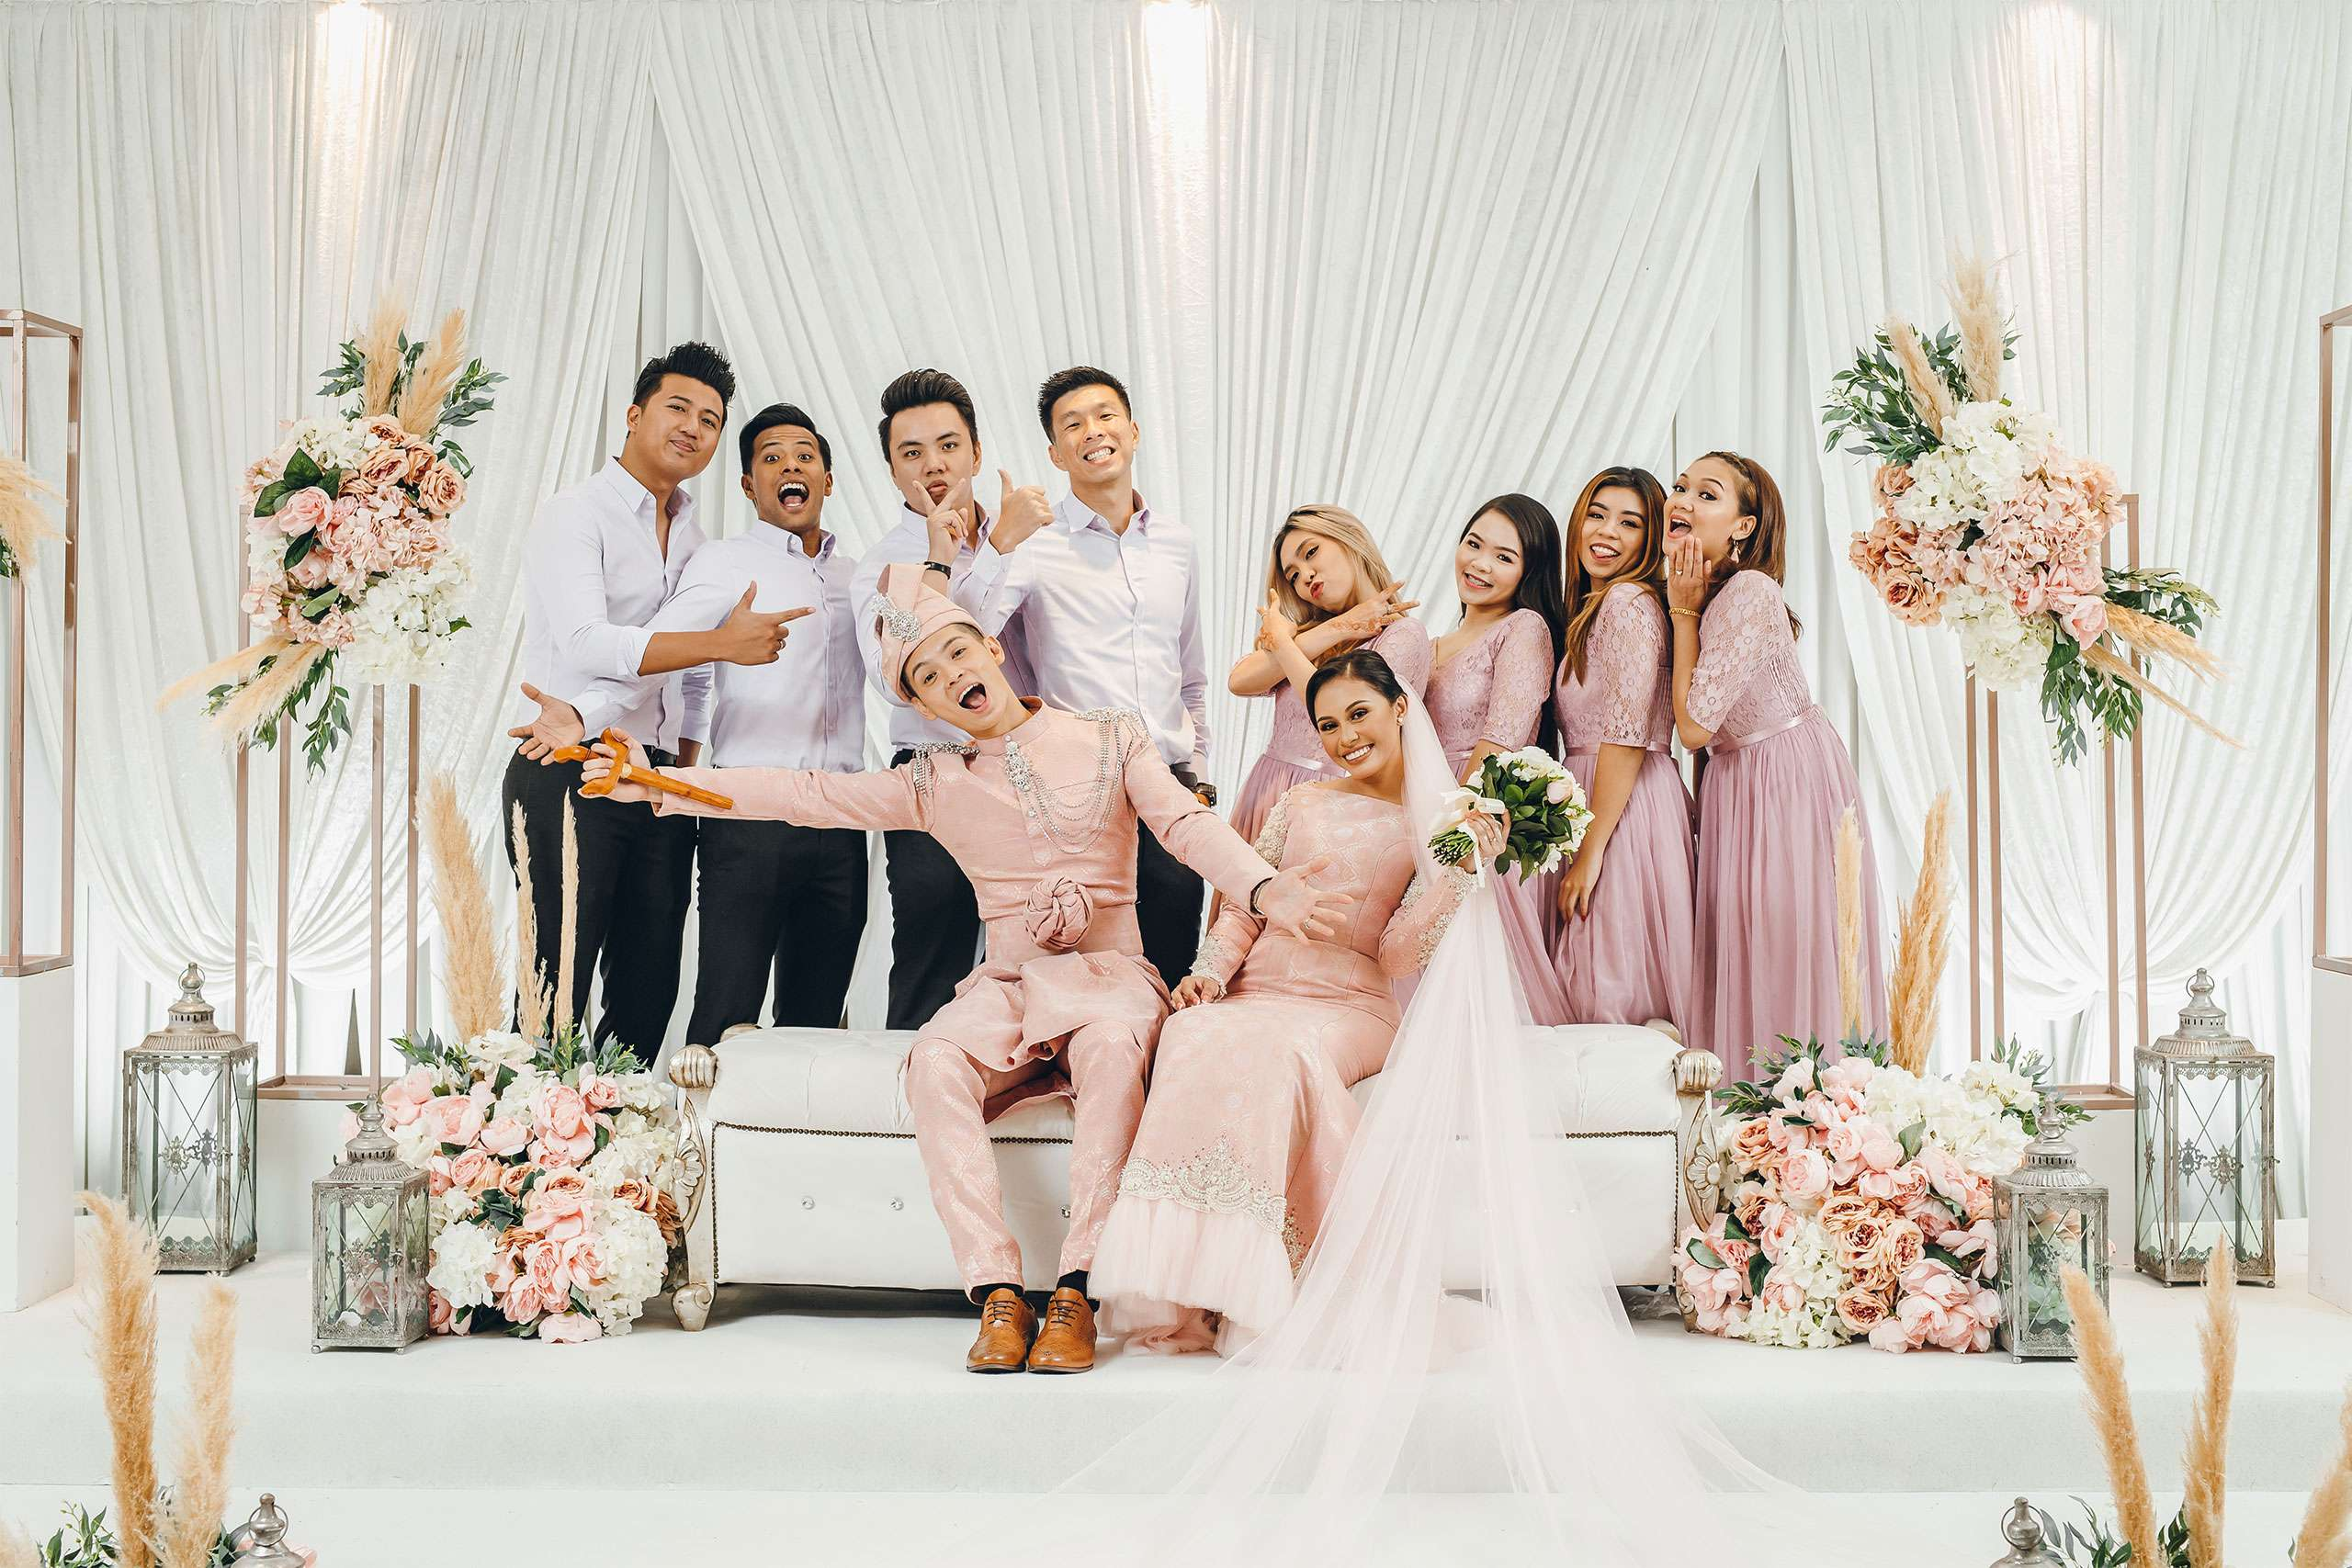 Our wedding journal - Studio Five Weddings